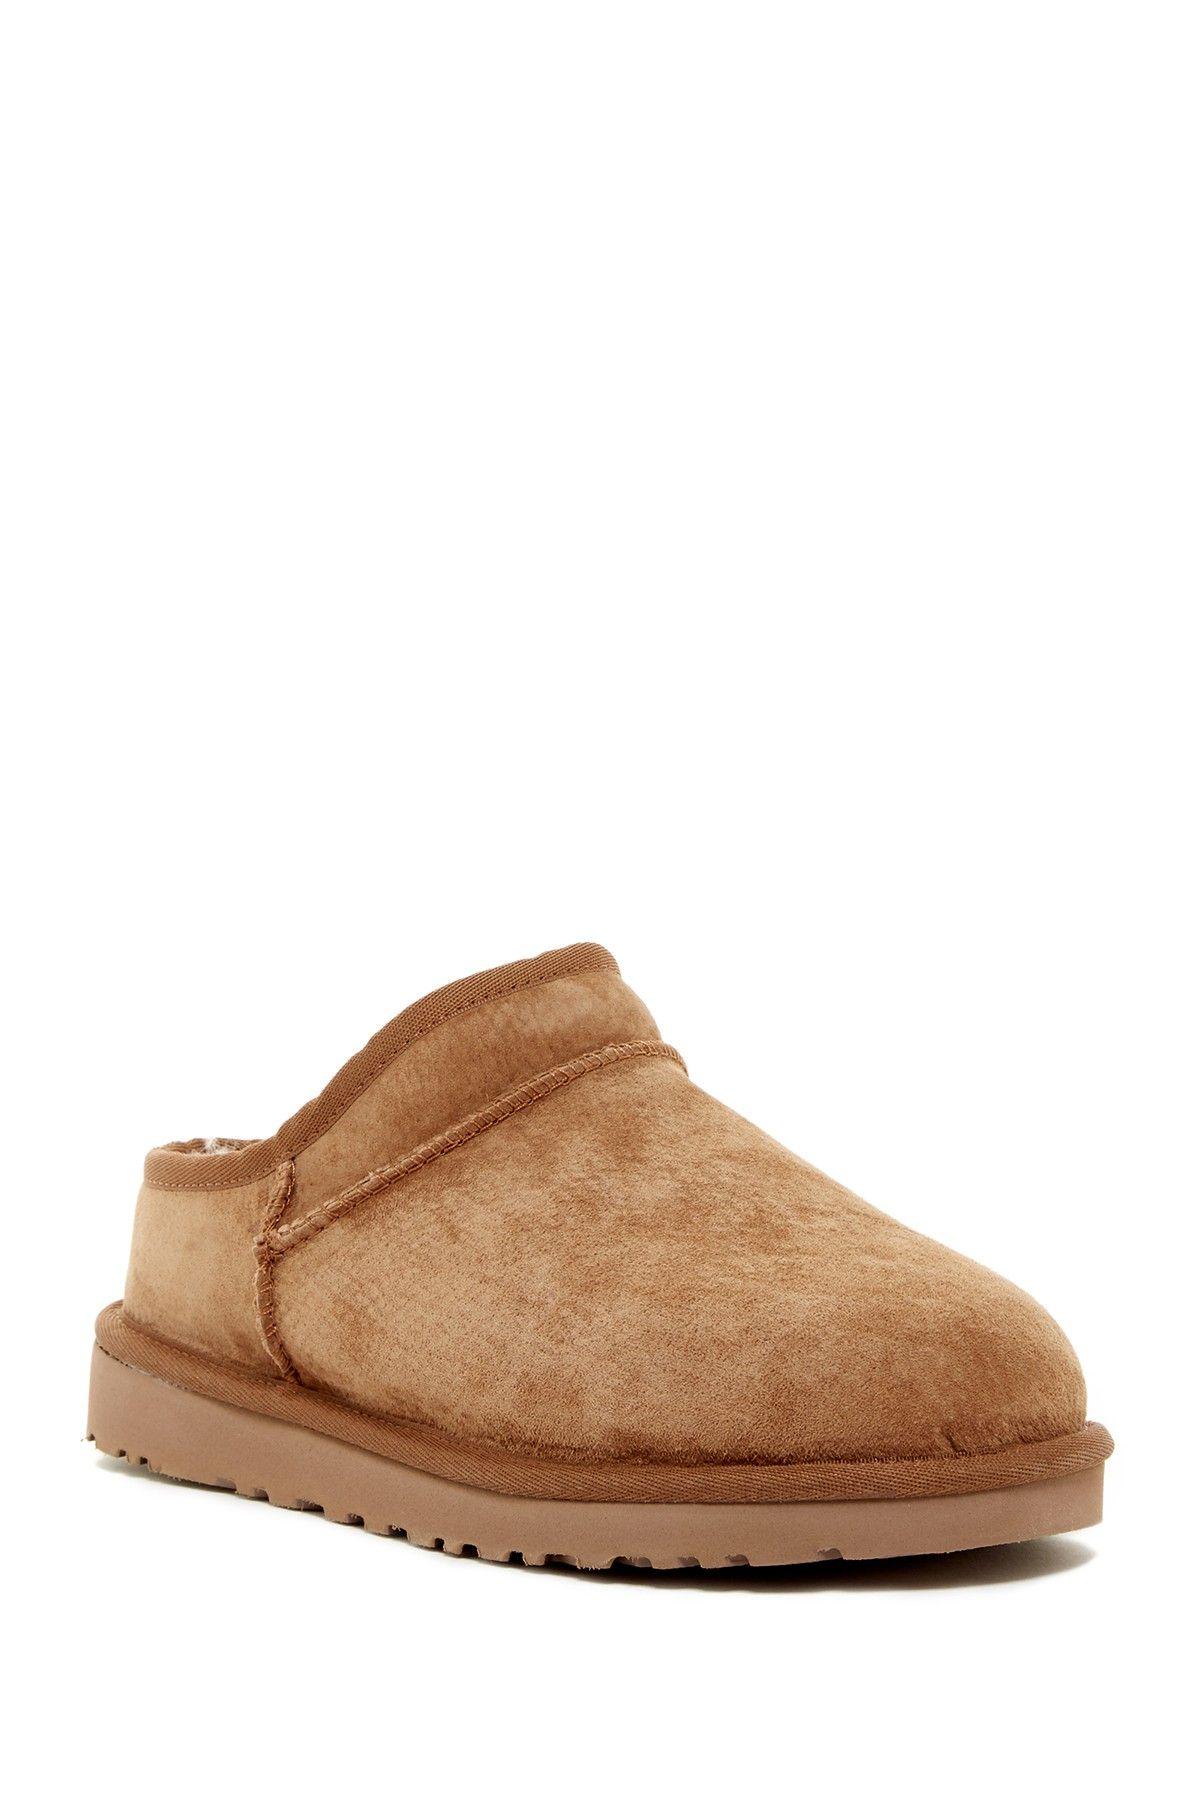 nordstrom rack ugg slippers